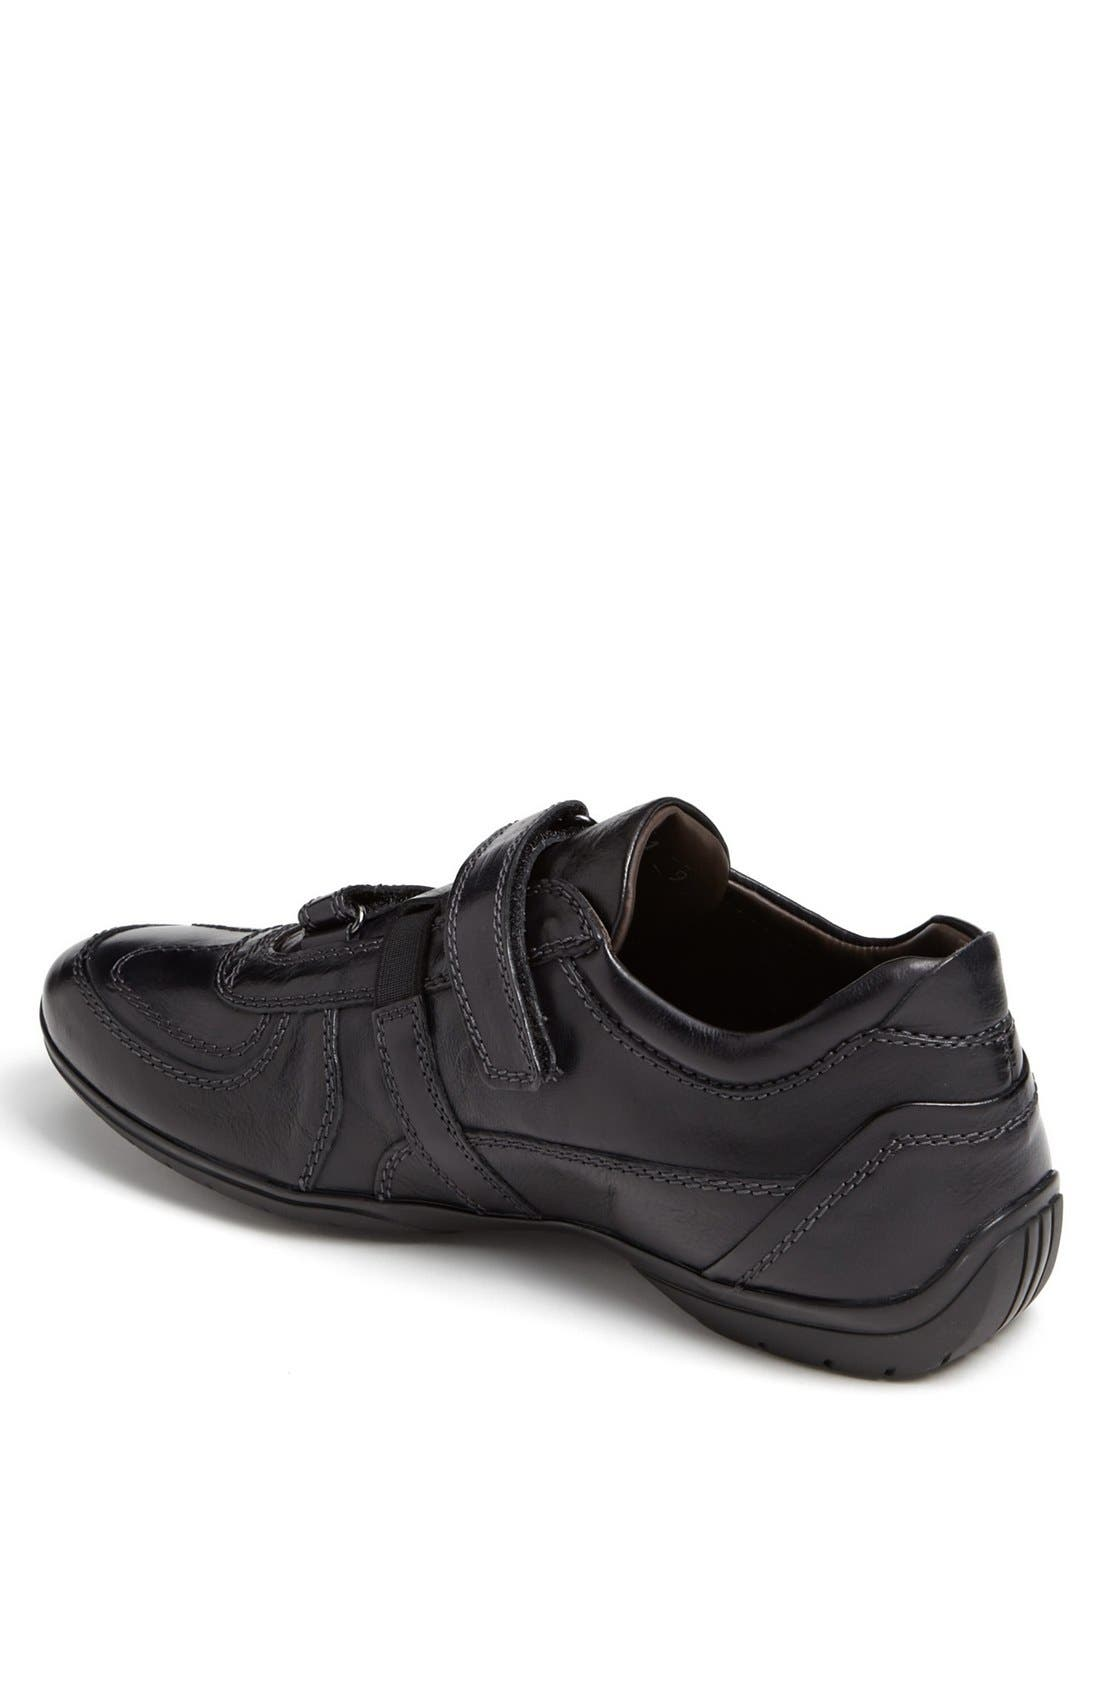 Alternate Image 2  - Bacco Bucci 'Punto' Sneaker